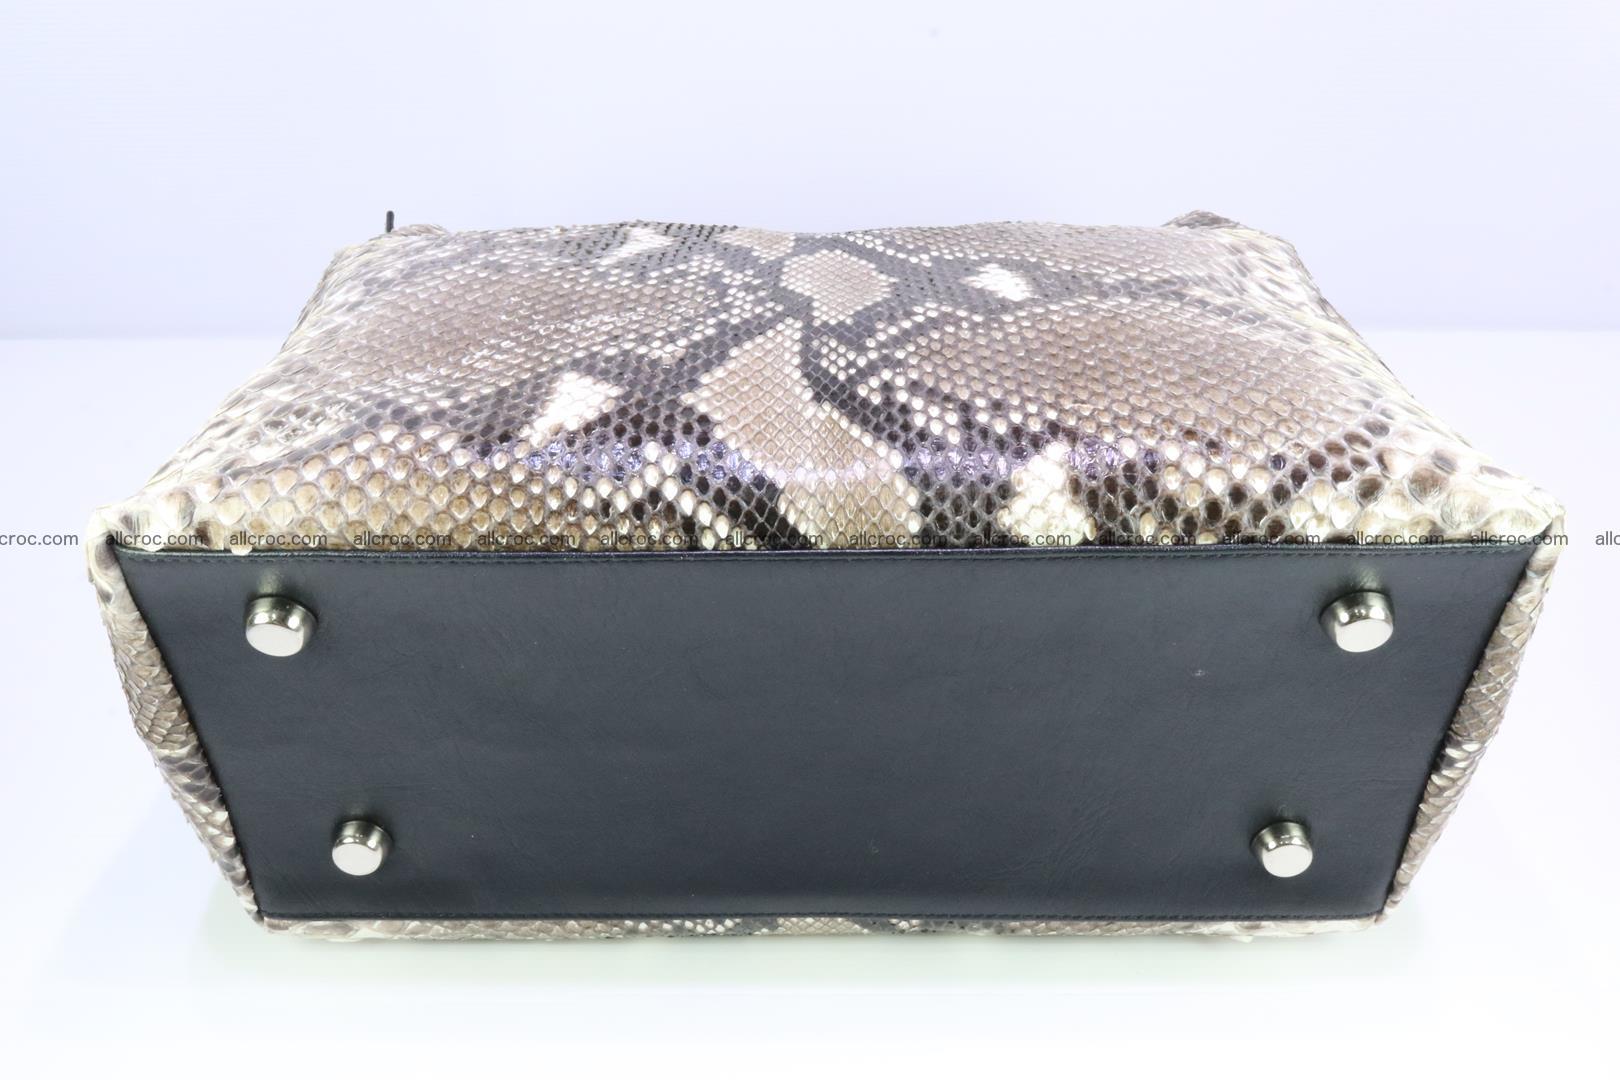 Python skin handbag for lady from genuine Python skin 206 Foto 5